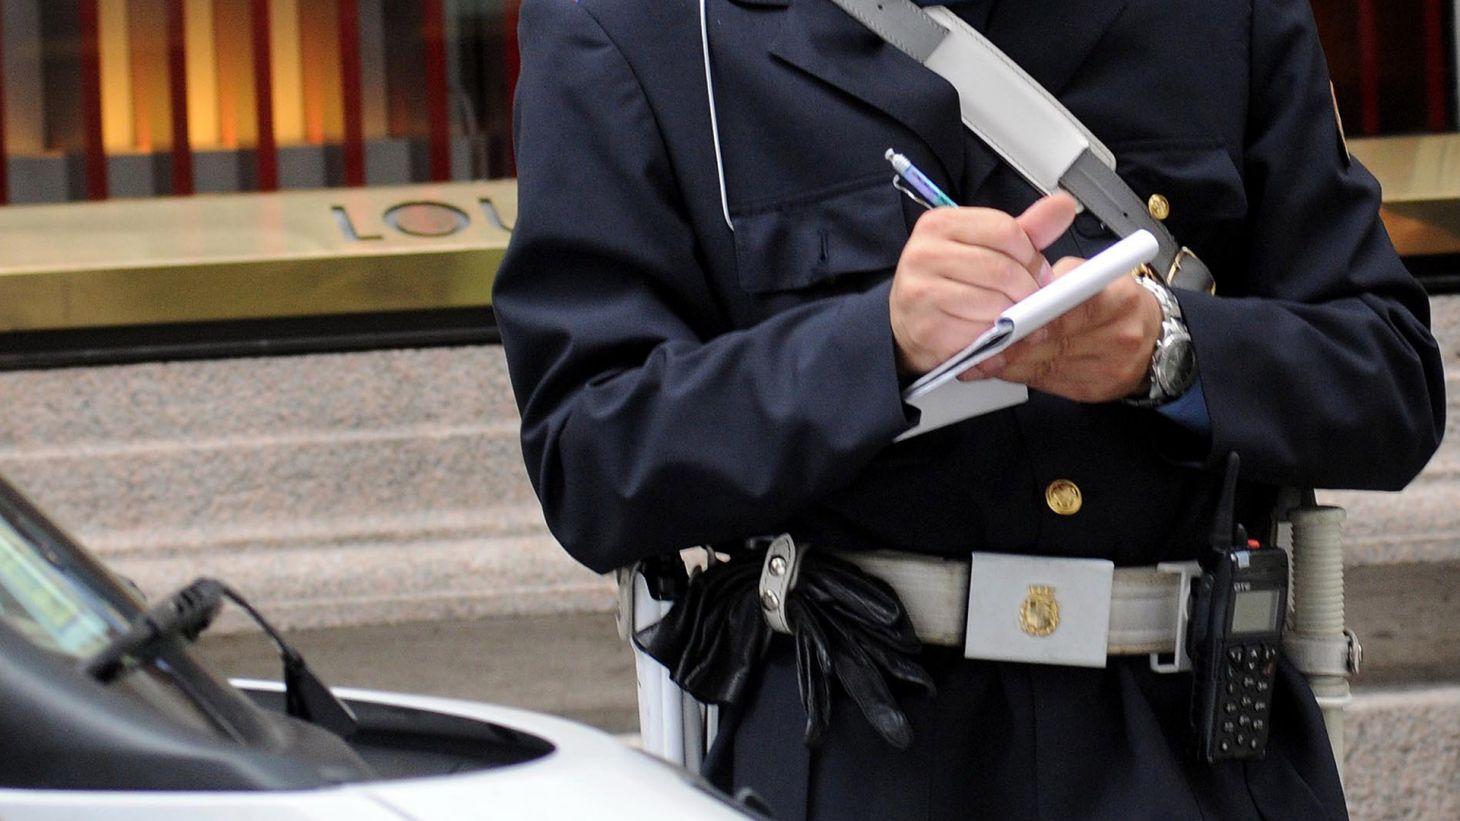 agente transito codigo brasileiro multas infracoes